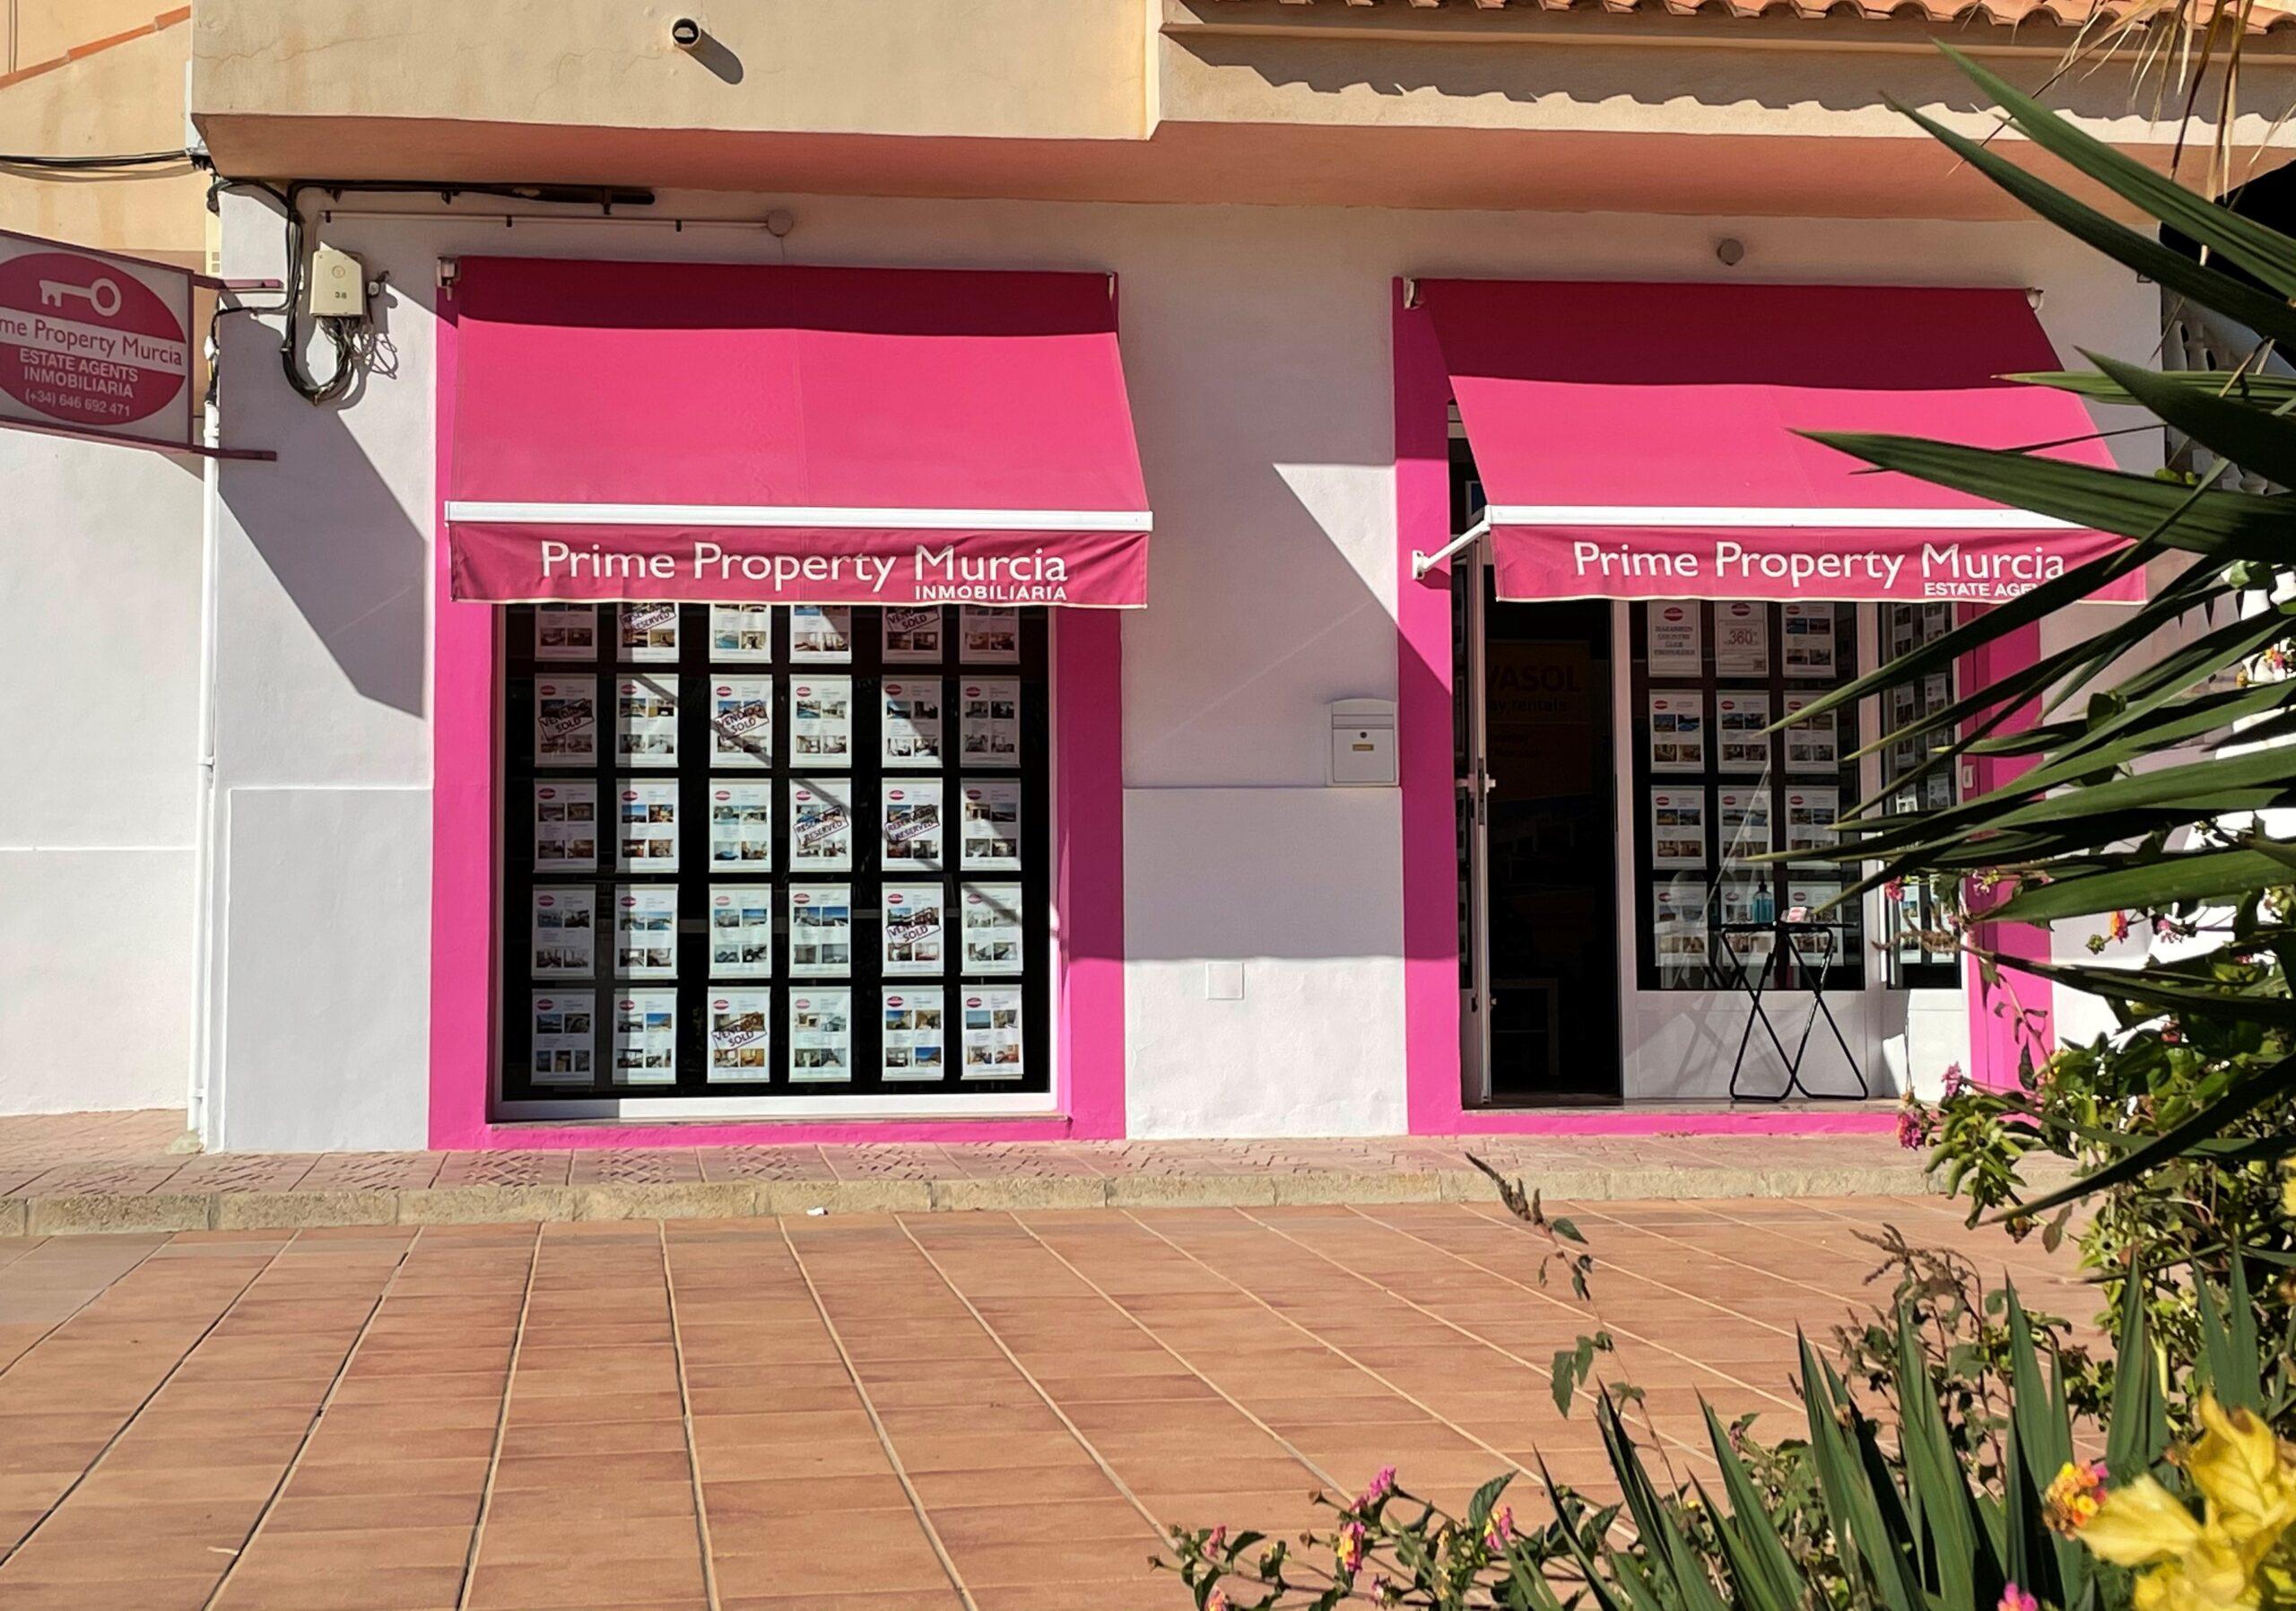 Prime Property Murcia